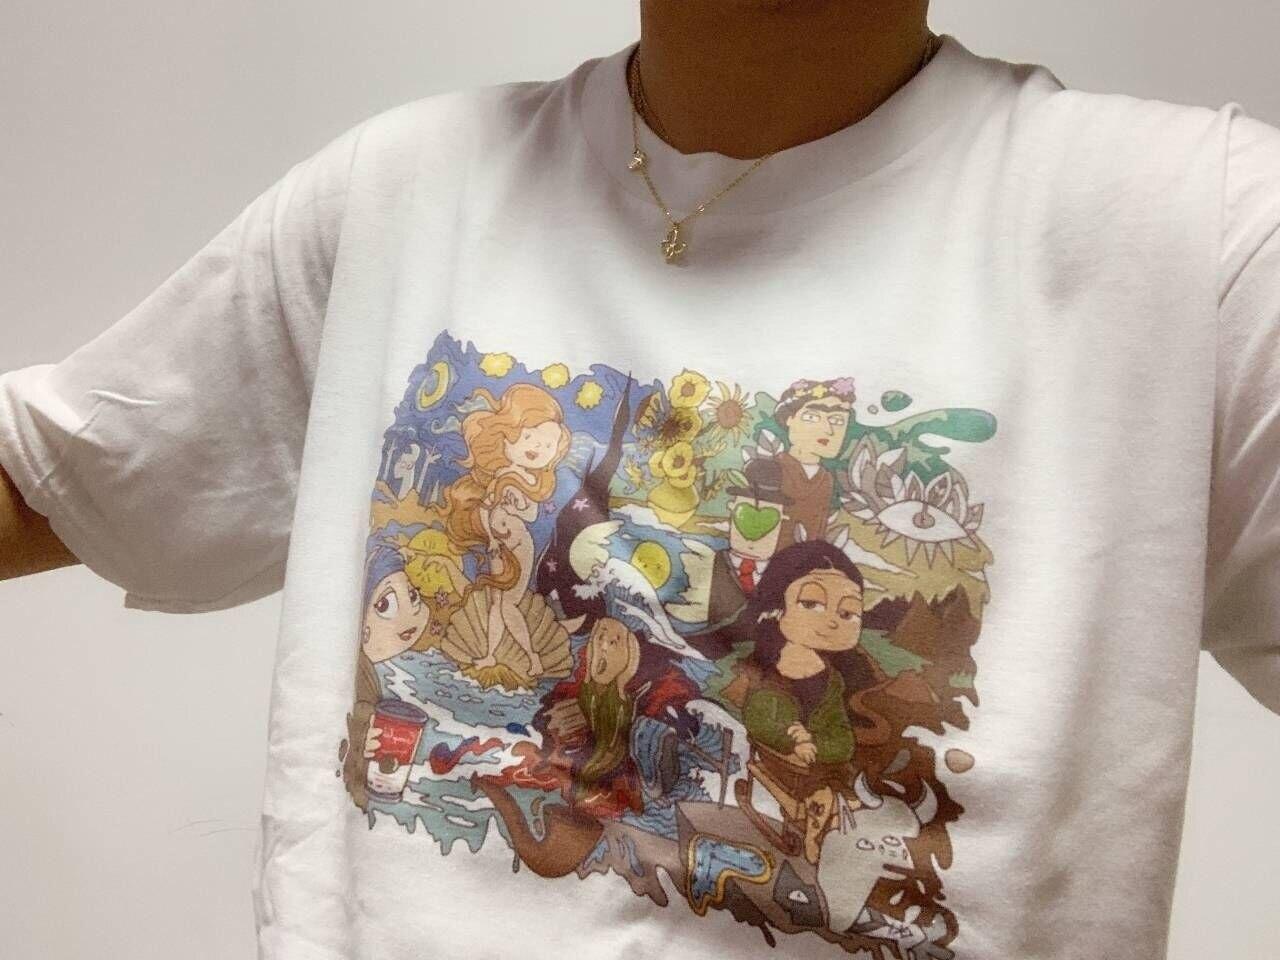 Kuakuayu HJN moda Arty Fartsy famosa pintura Van Gogh Picasso Da kinca Mona Lisa estrella noche impresa camiseta